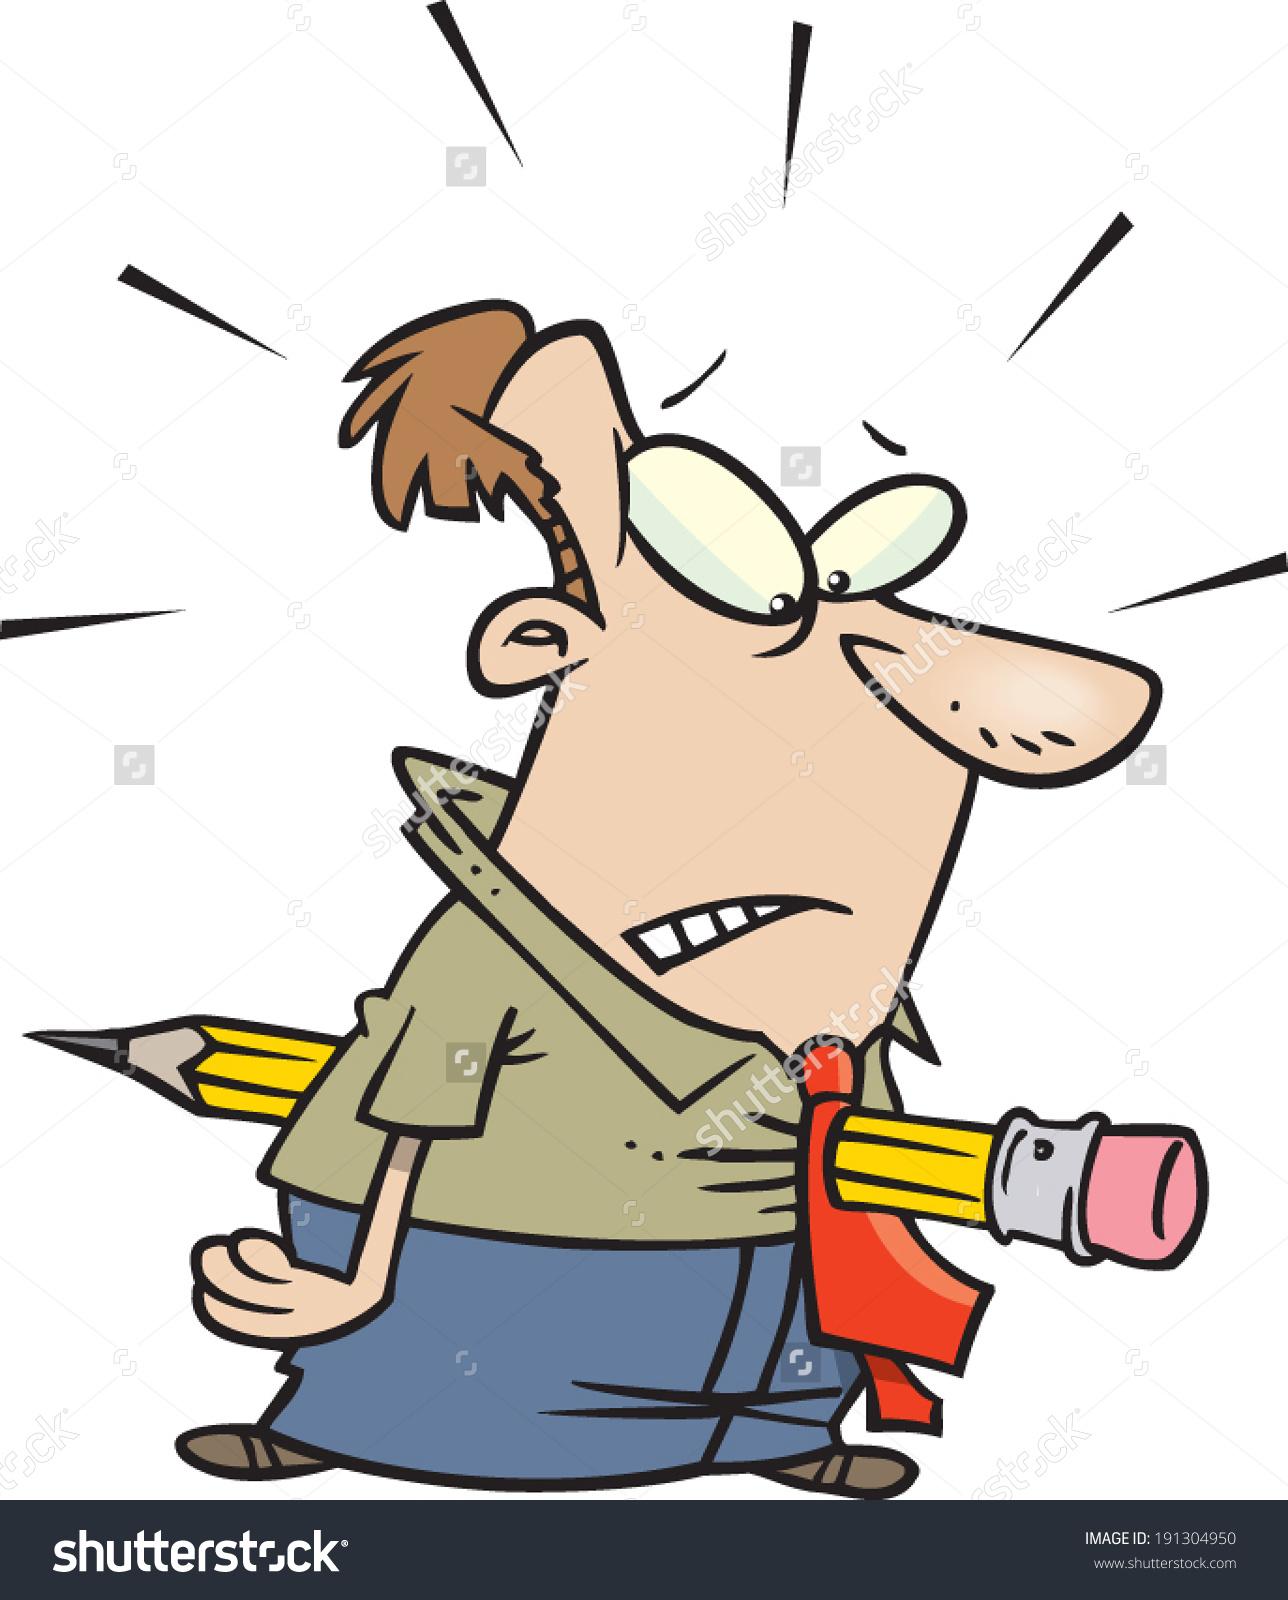 Cartoon Man Impaled By Pencil Stock Vector 191304950.